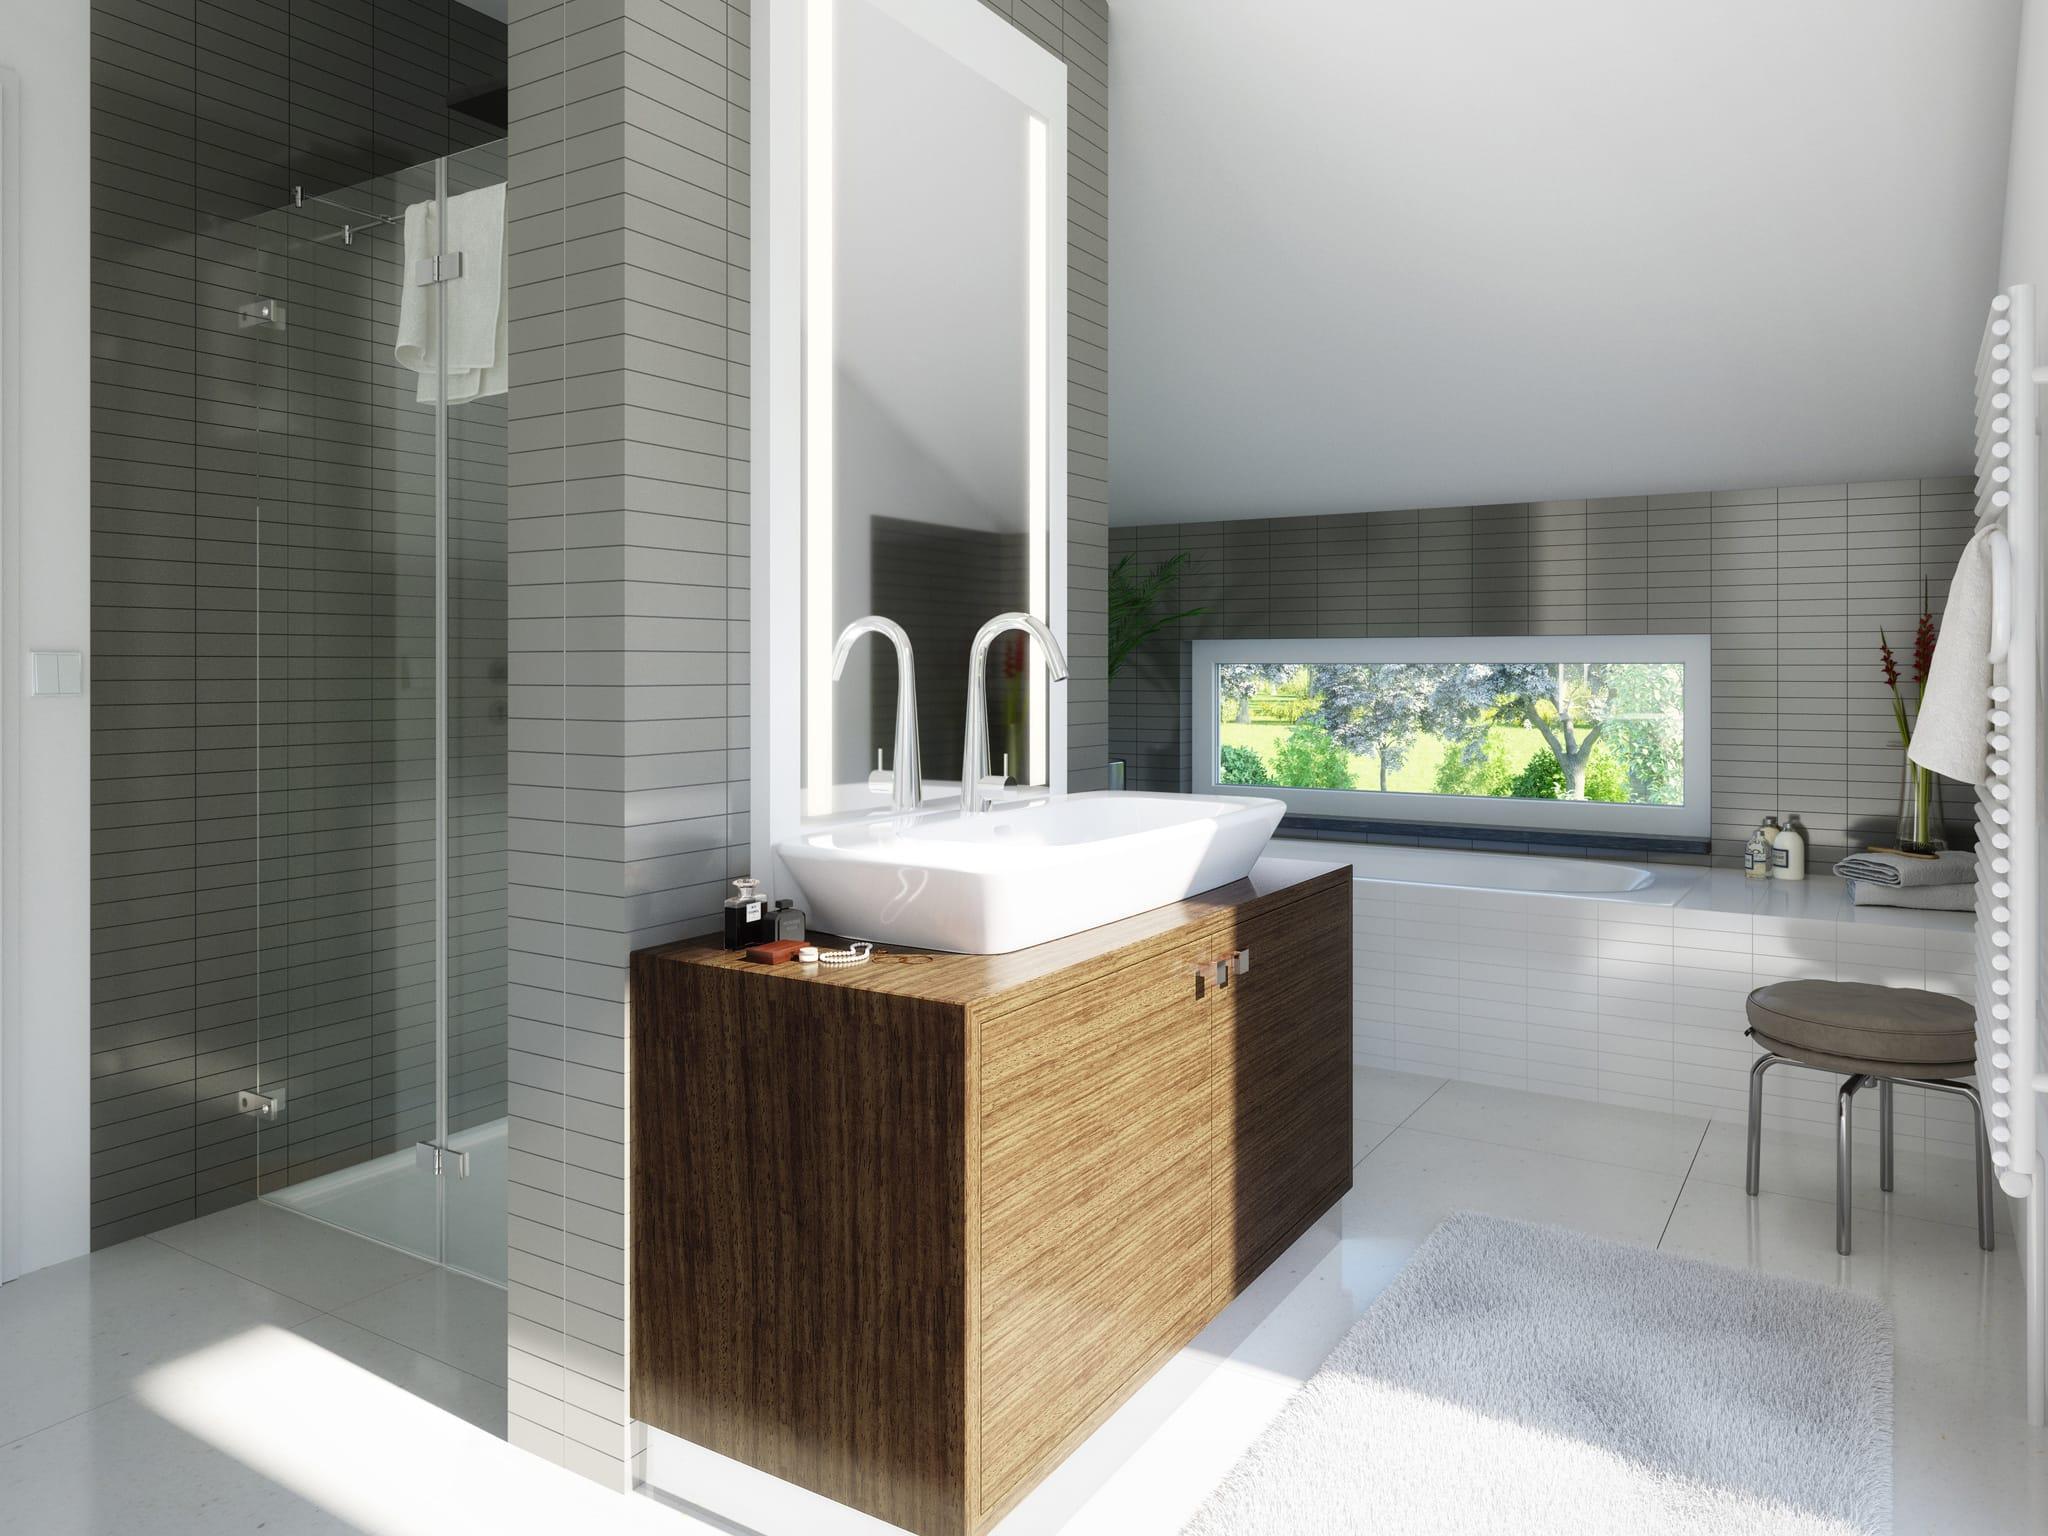 Badezimmer Ideen - Stadtvilla Inneneinrichtung Fertighaus SUNSHINE 165 V6 von Living Haus - HausbauDirekt.de